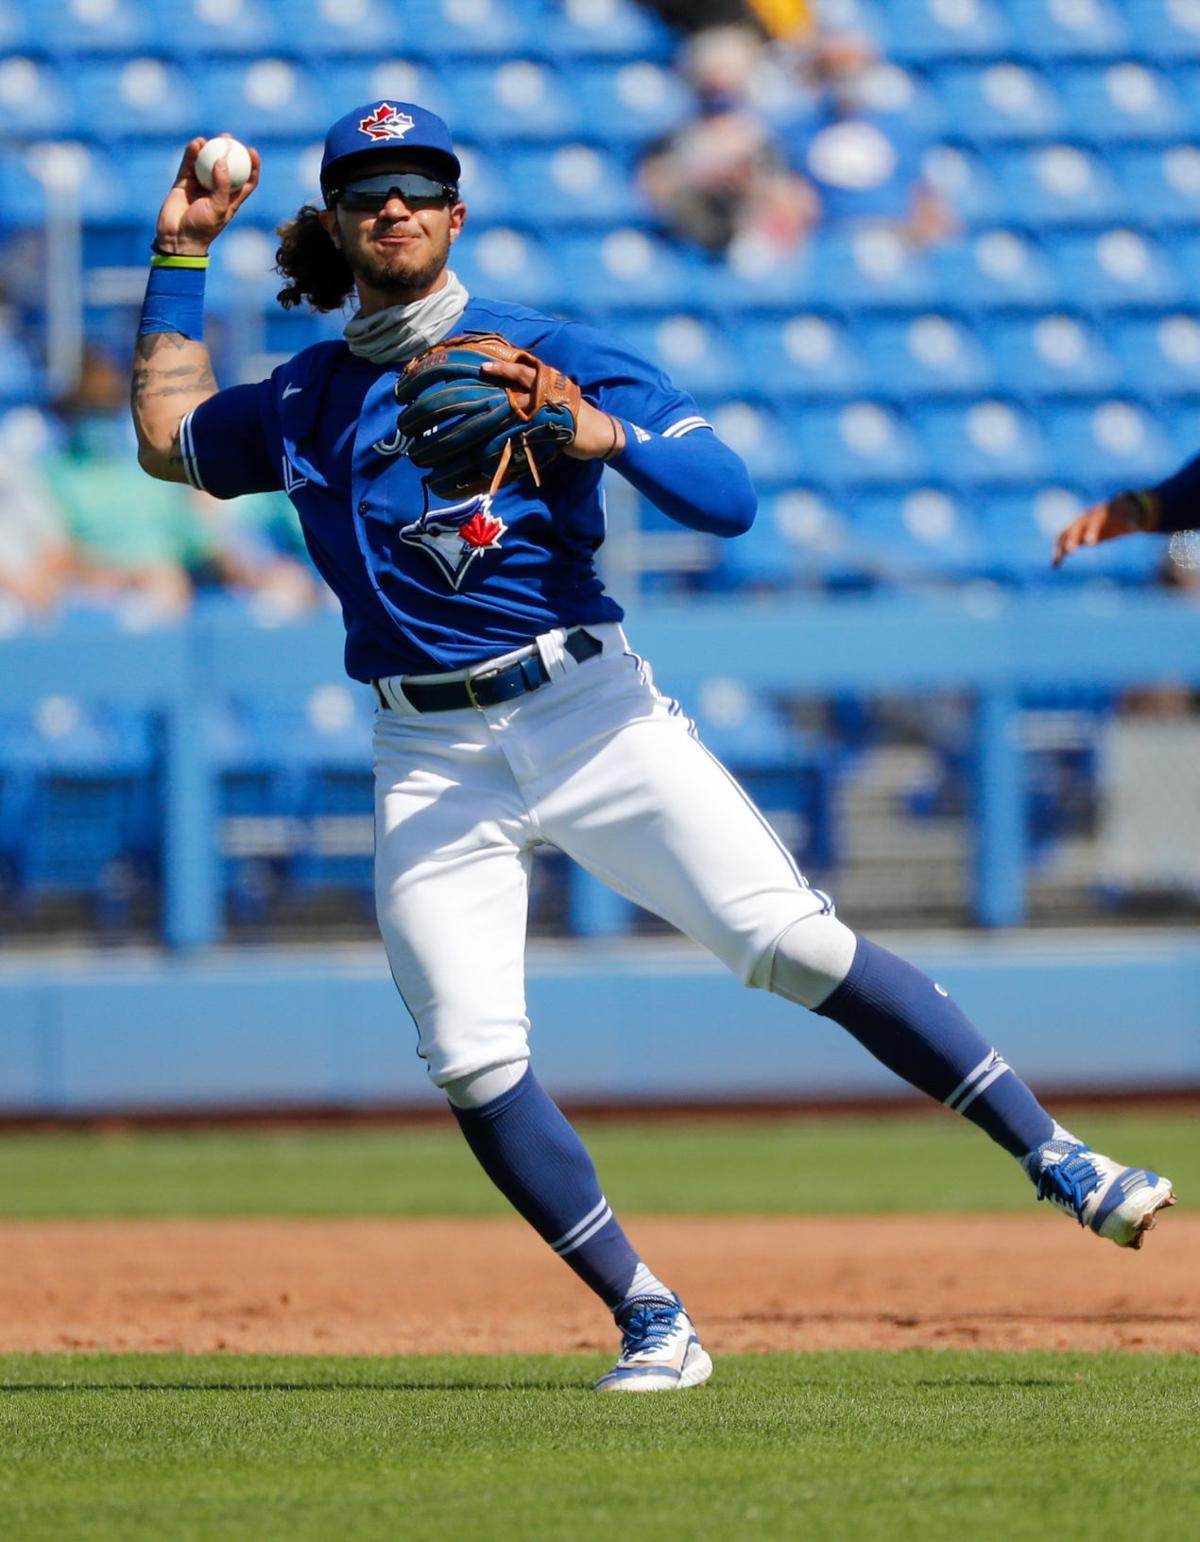 MLB: Pittsburgh Pirates at Toronto Blue Jays